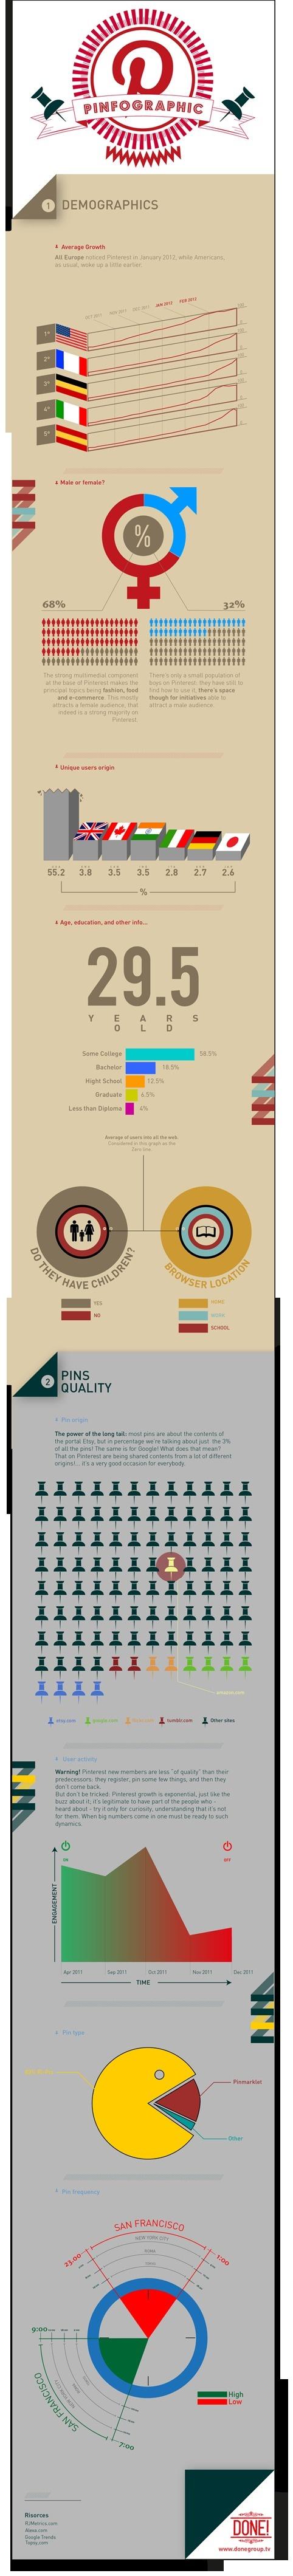 Infografica: Chi è che usa Pinterest?